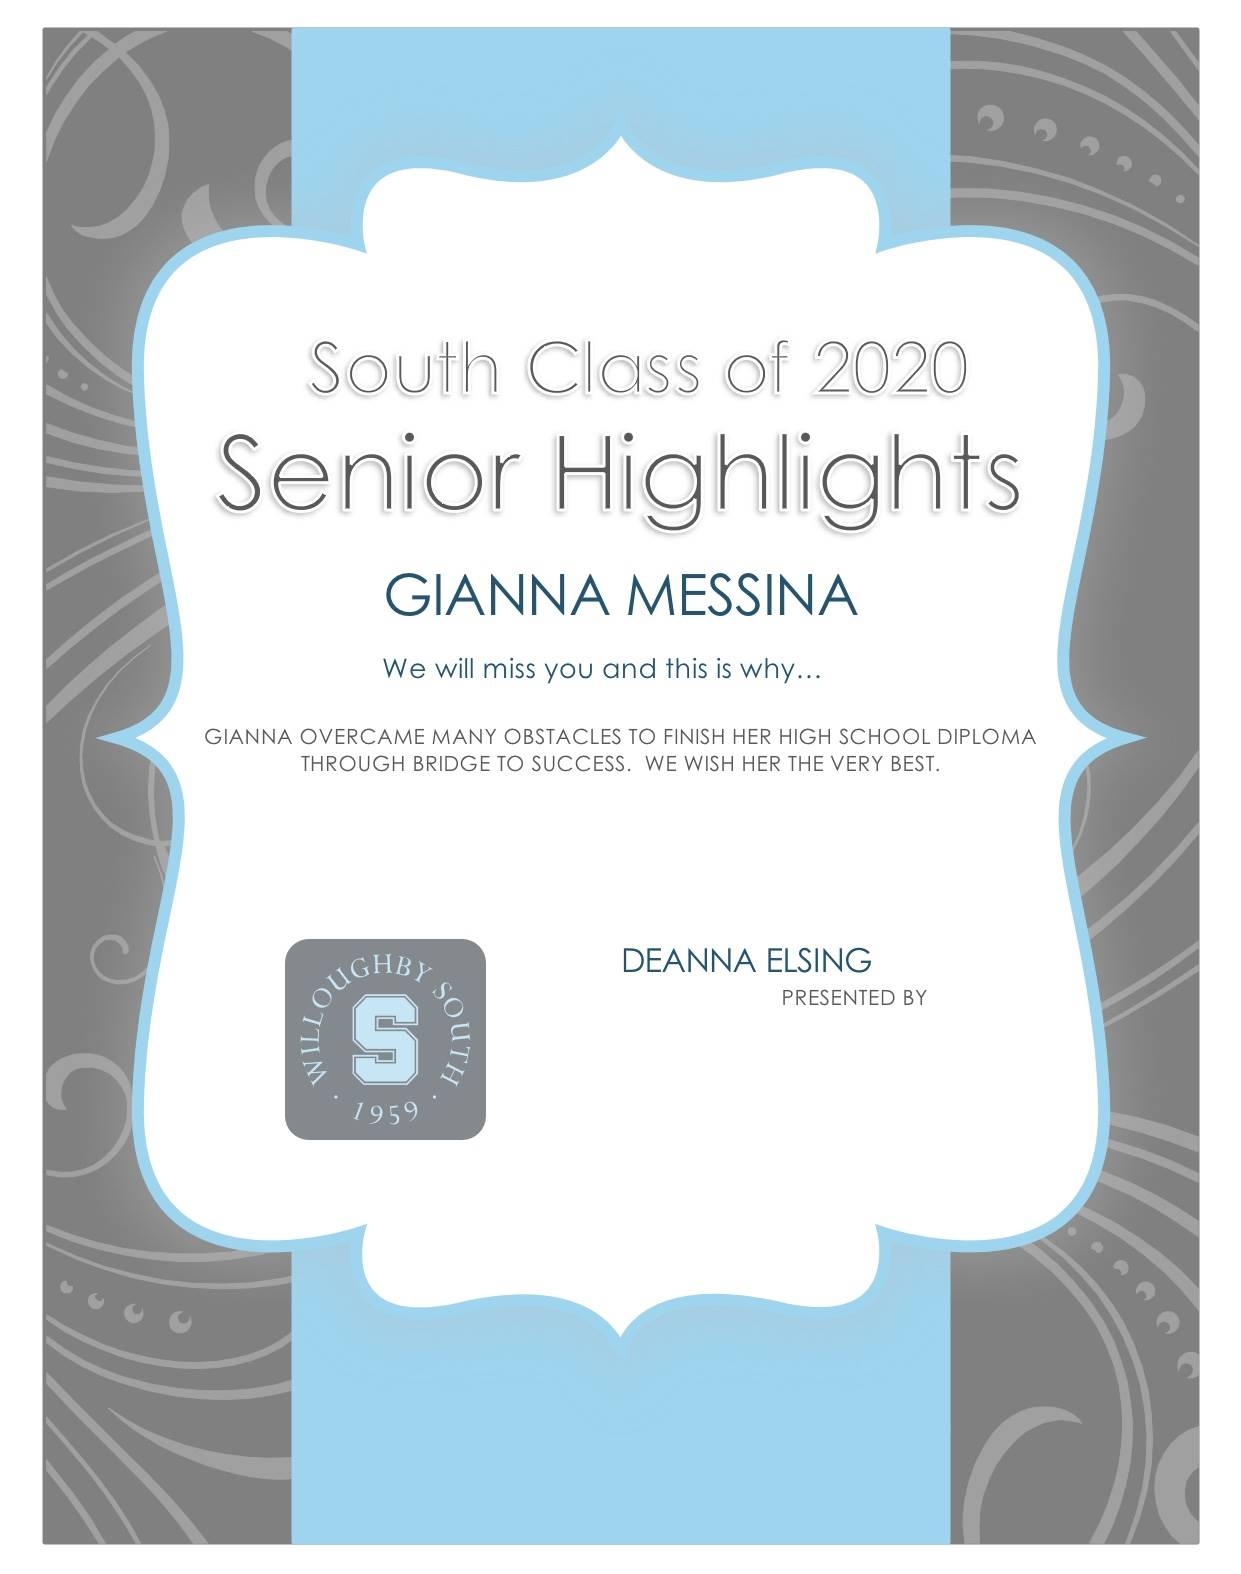 Gianna Messina